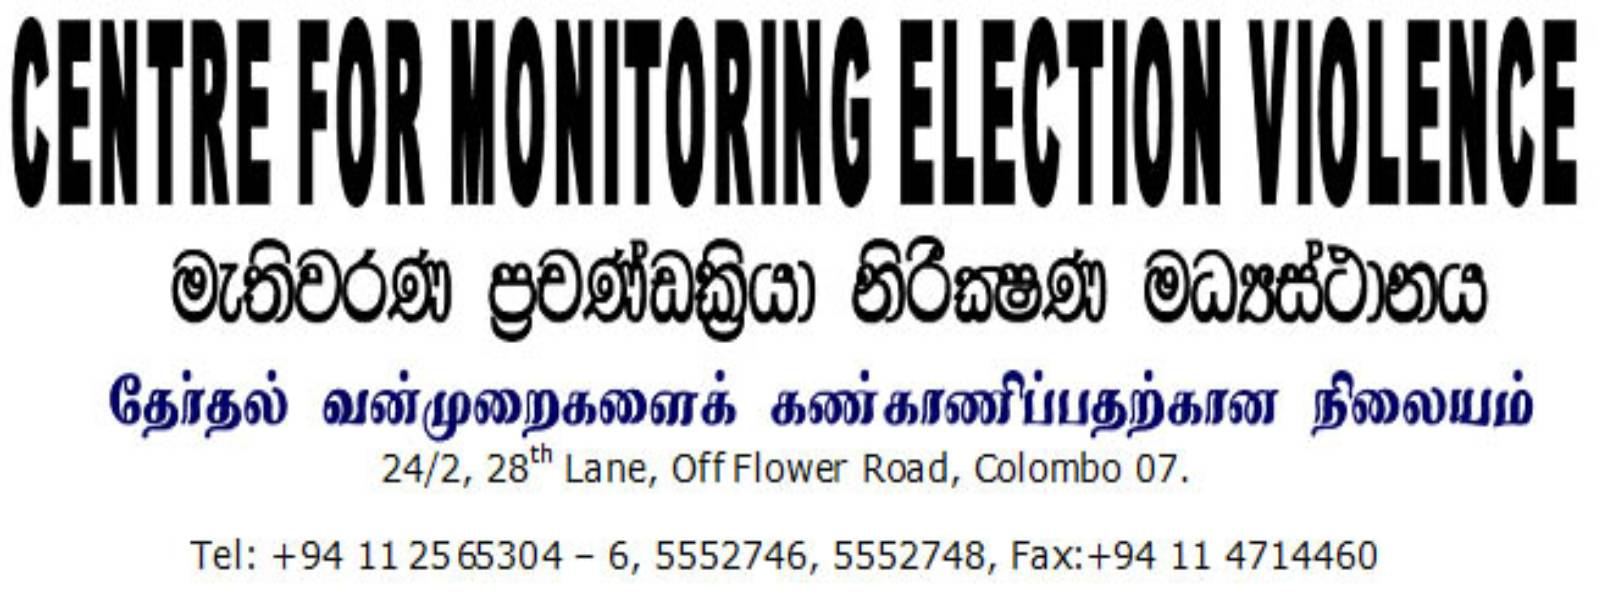 CMEV urges to postpone general election